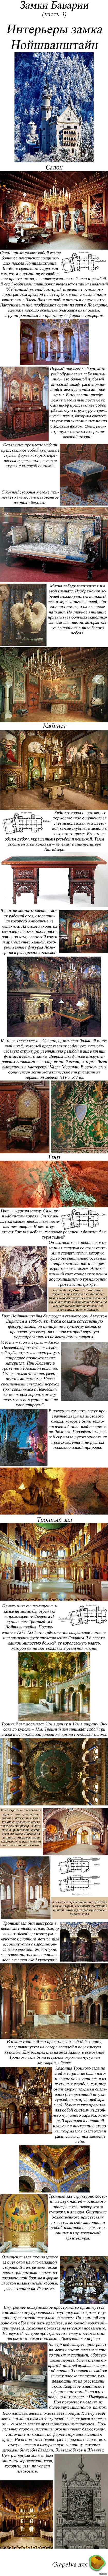 "Замки Баварии (часть 3). Интерьеры замка Нойшванштайн <a href=""http://pikabu.ru/story/zamki_bavarii_chast_1_zamok_noyshvanshtayn_1918600"">http://pikabu.ru/story/_1918600</a>  <a href=""http://pikabu.ru/story/zamki_bavarii_chast_2_intereryi_zamka_noyshvanshtayn_1930059"">http://pikabu.ru/story/_1930059</a>"